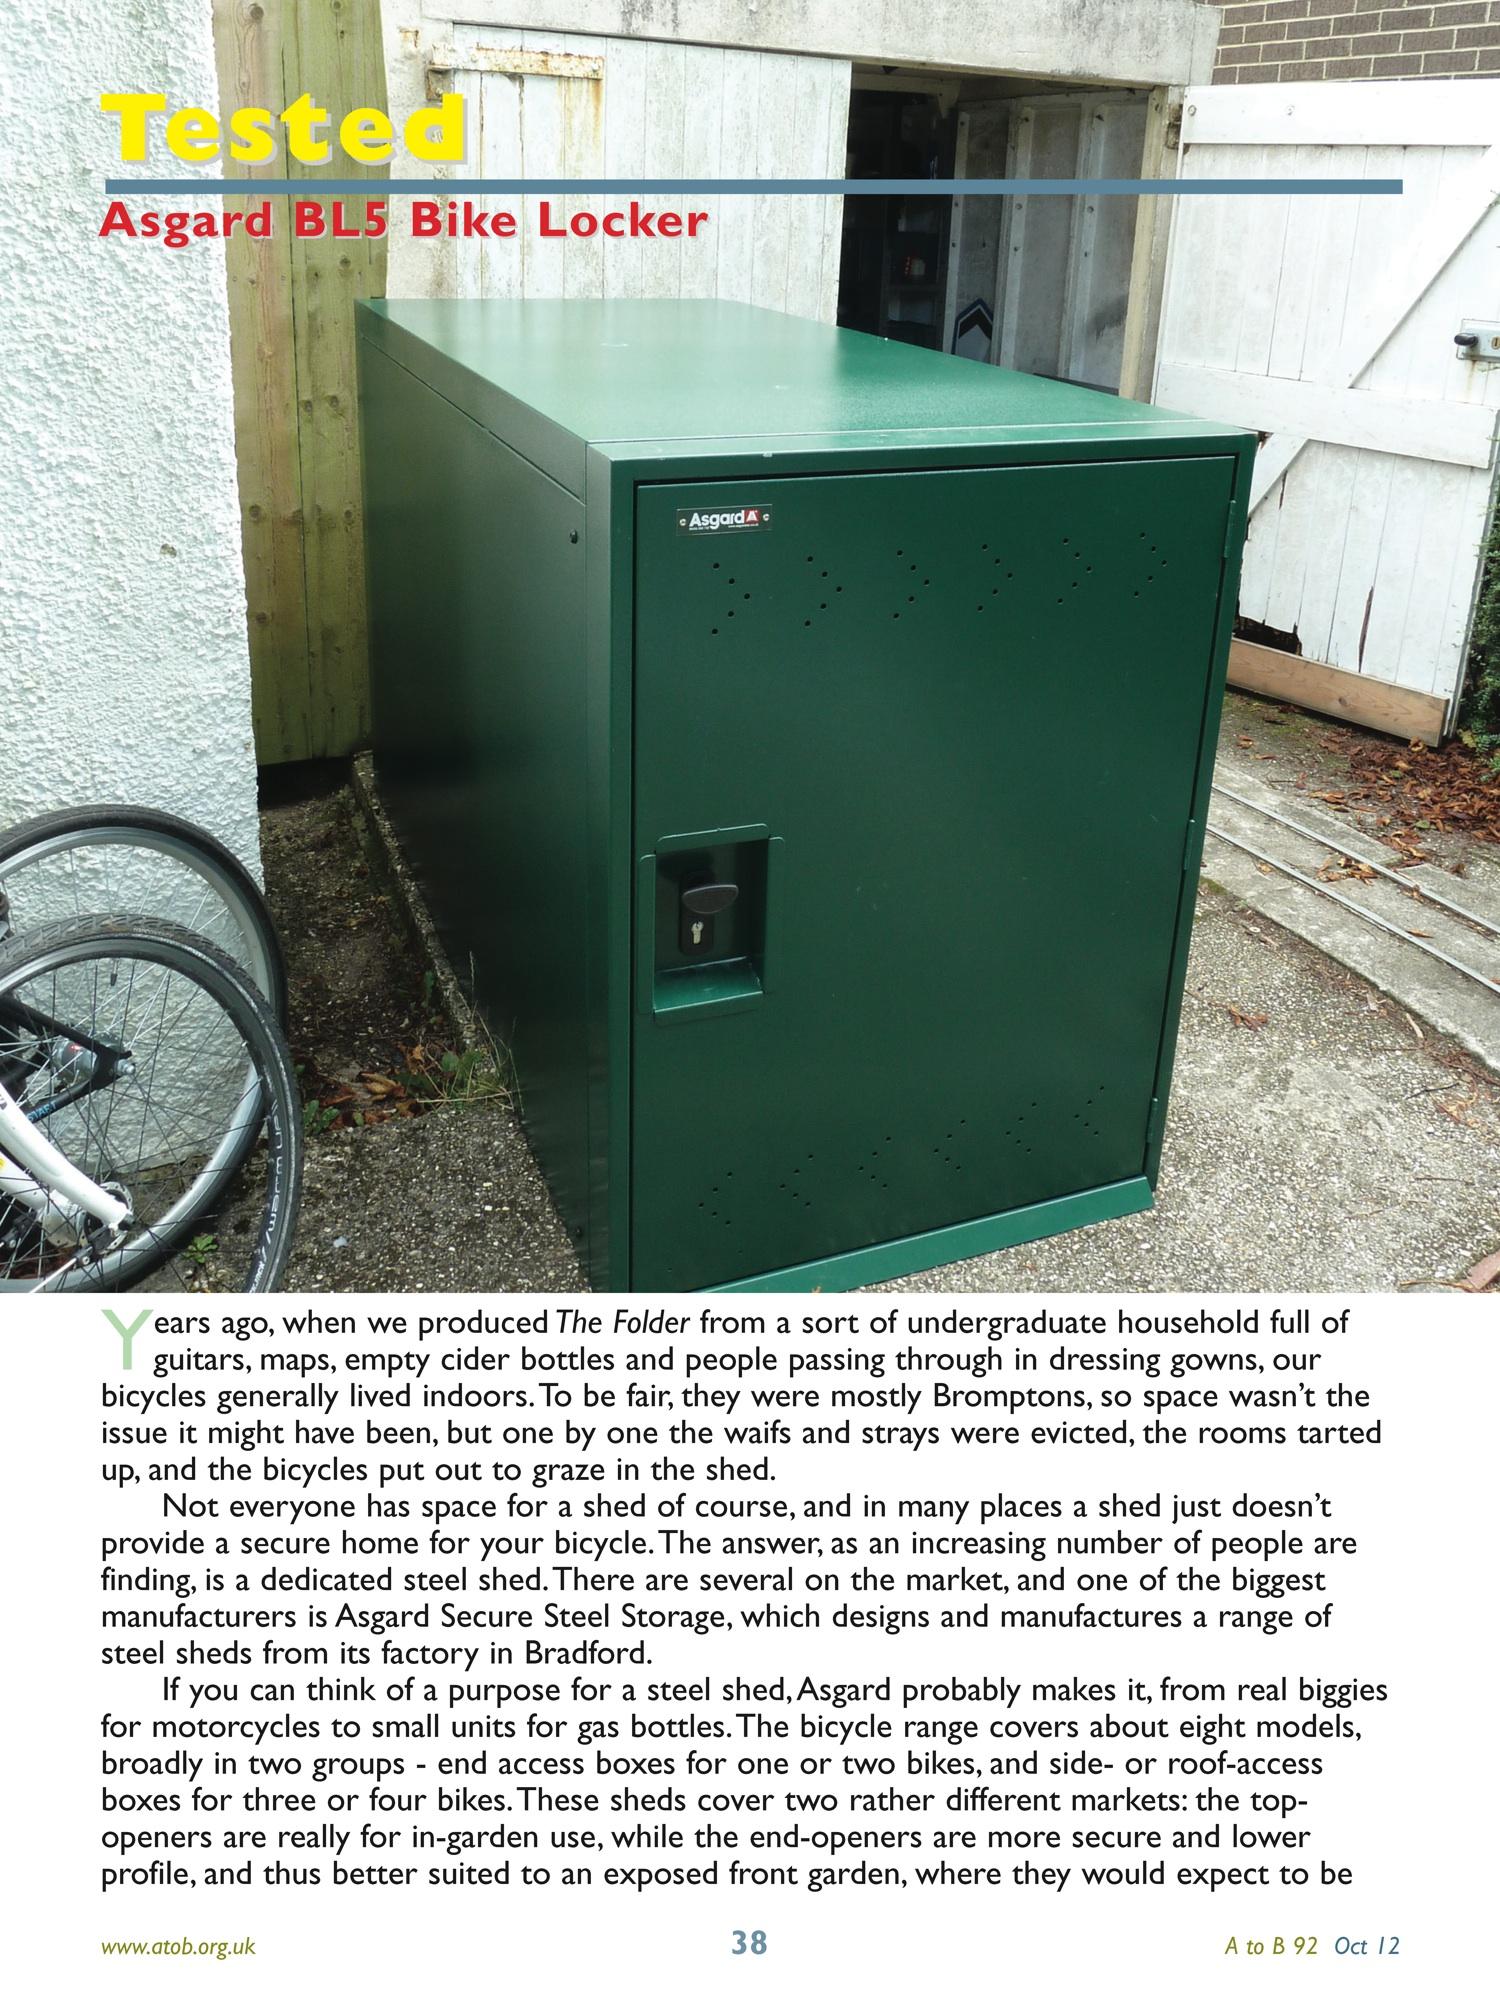 AtoB Bike Locker Review